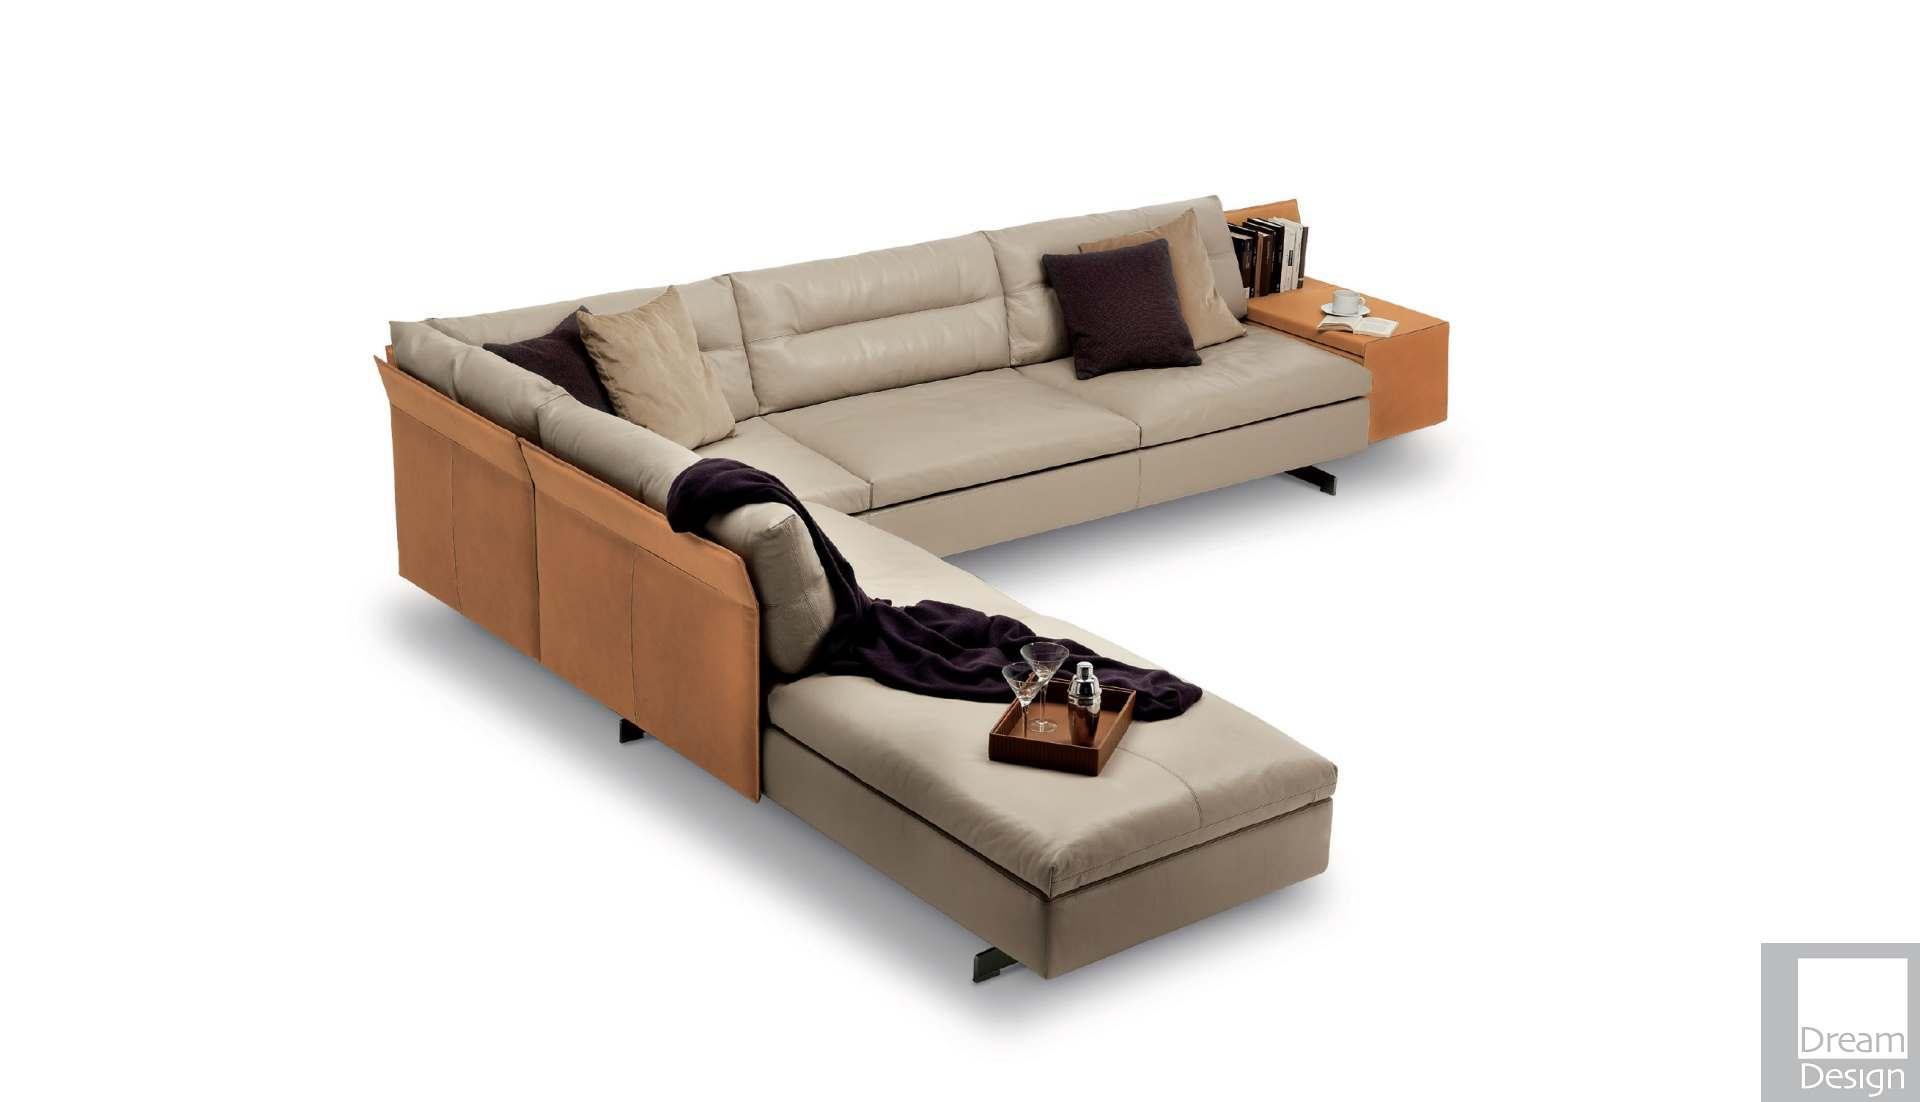 Poltrona Frau Grantorino Sofa - Dream Design Interiors Ltd